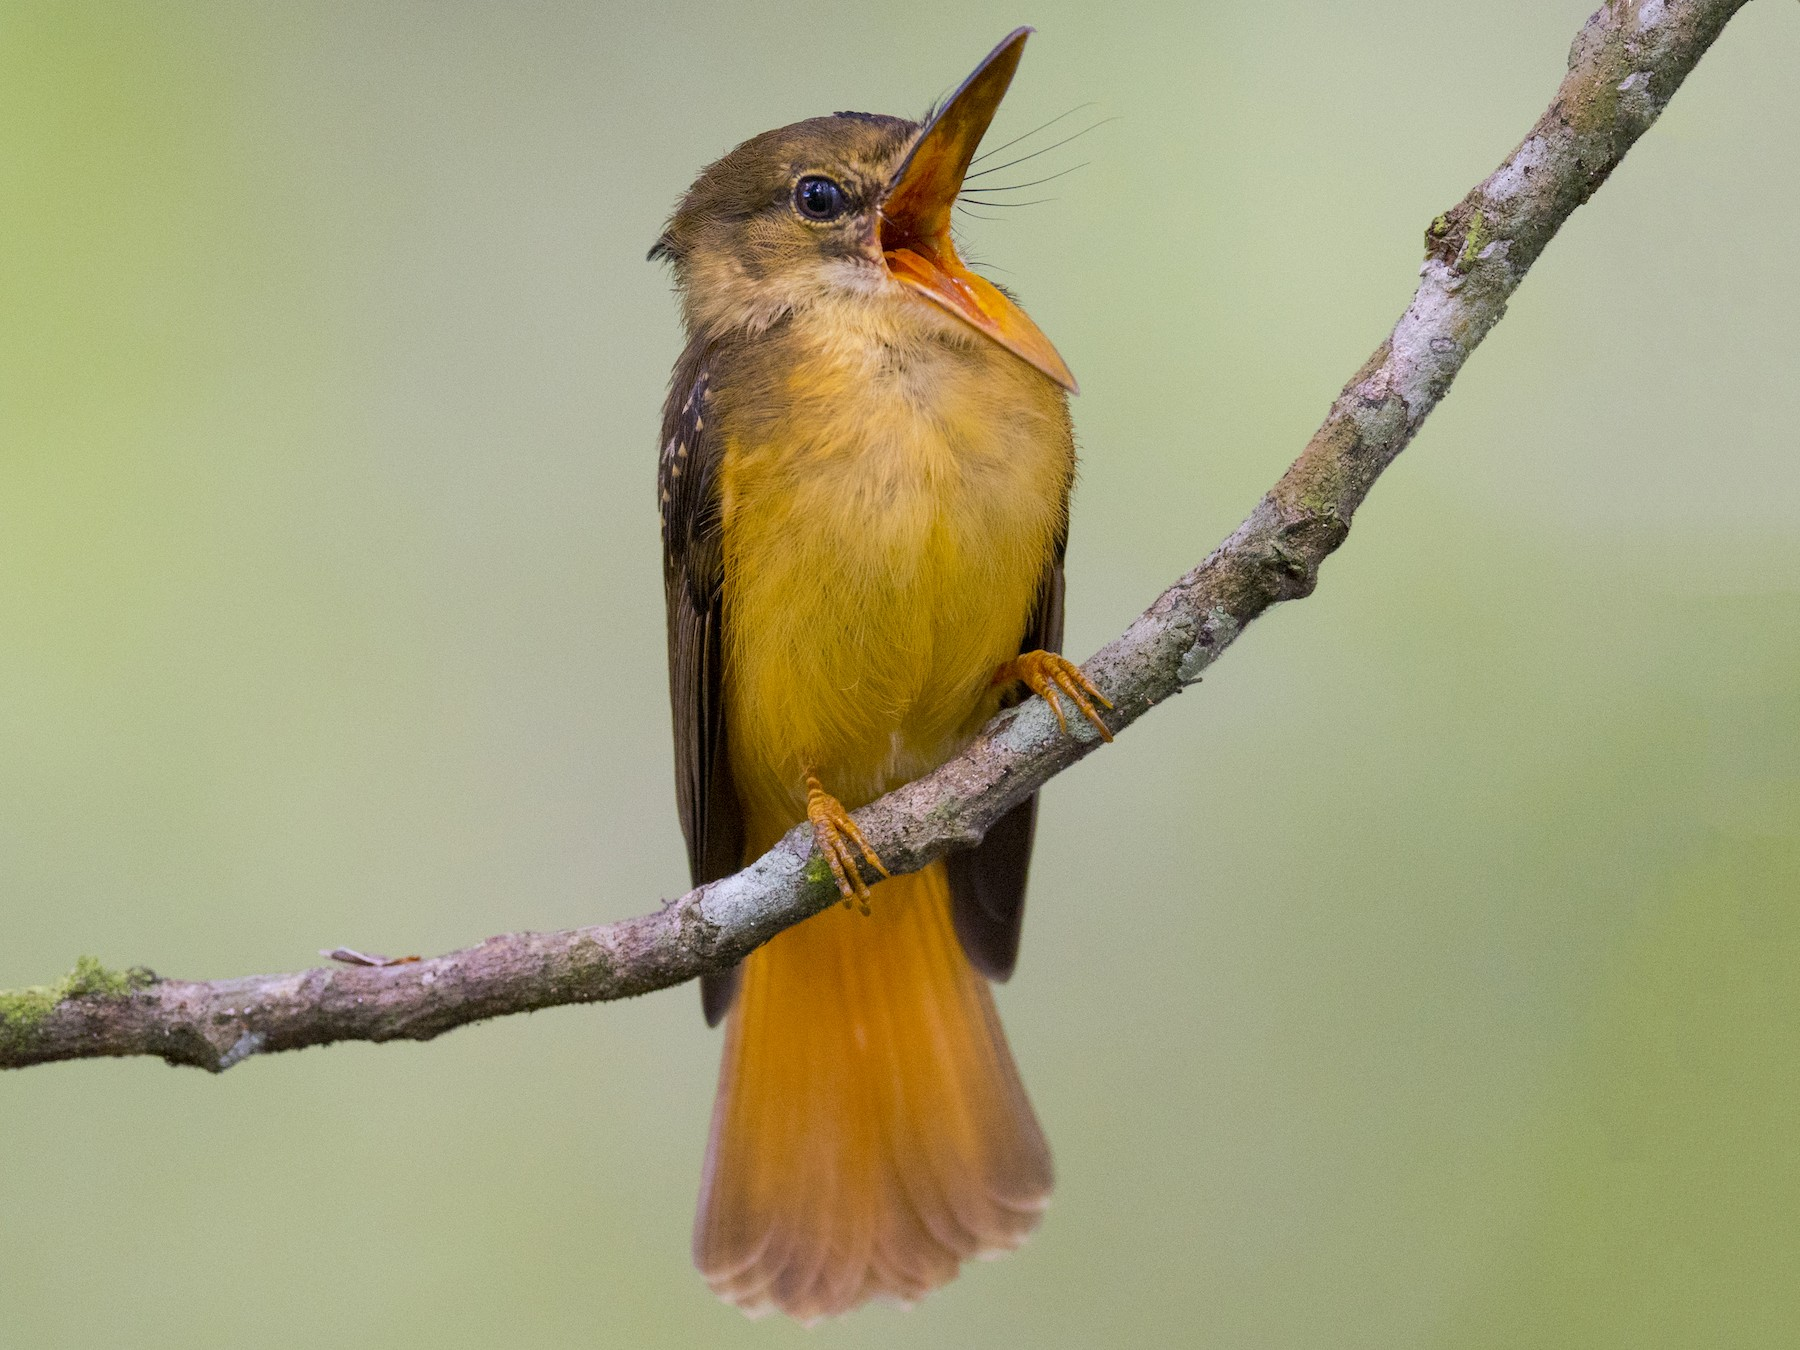 Royal Flycatcher - John Cahill xikanel.com